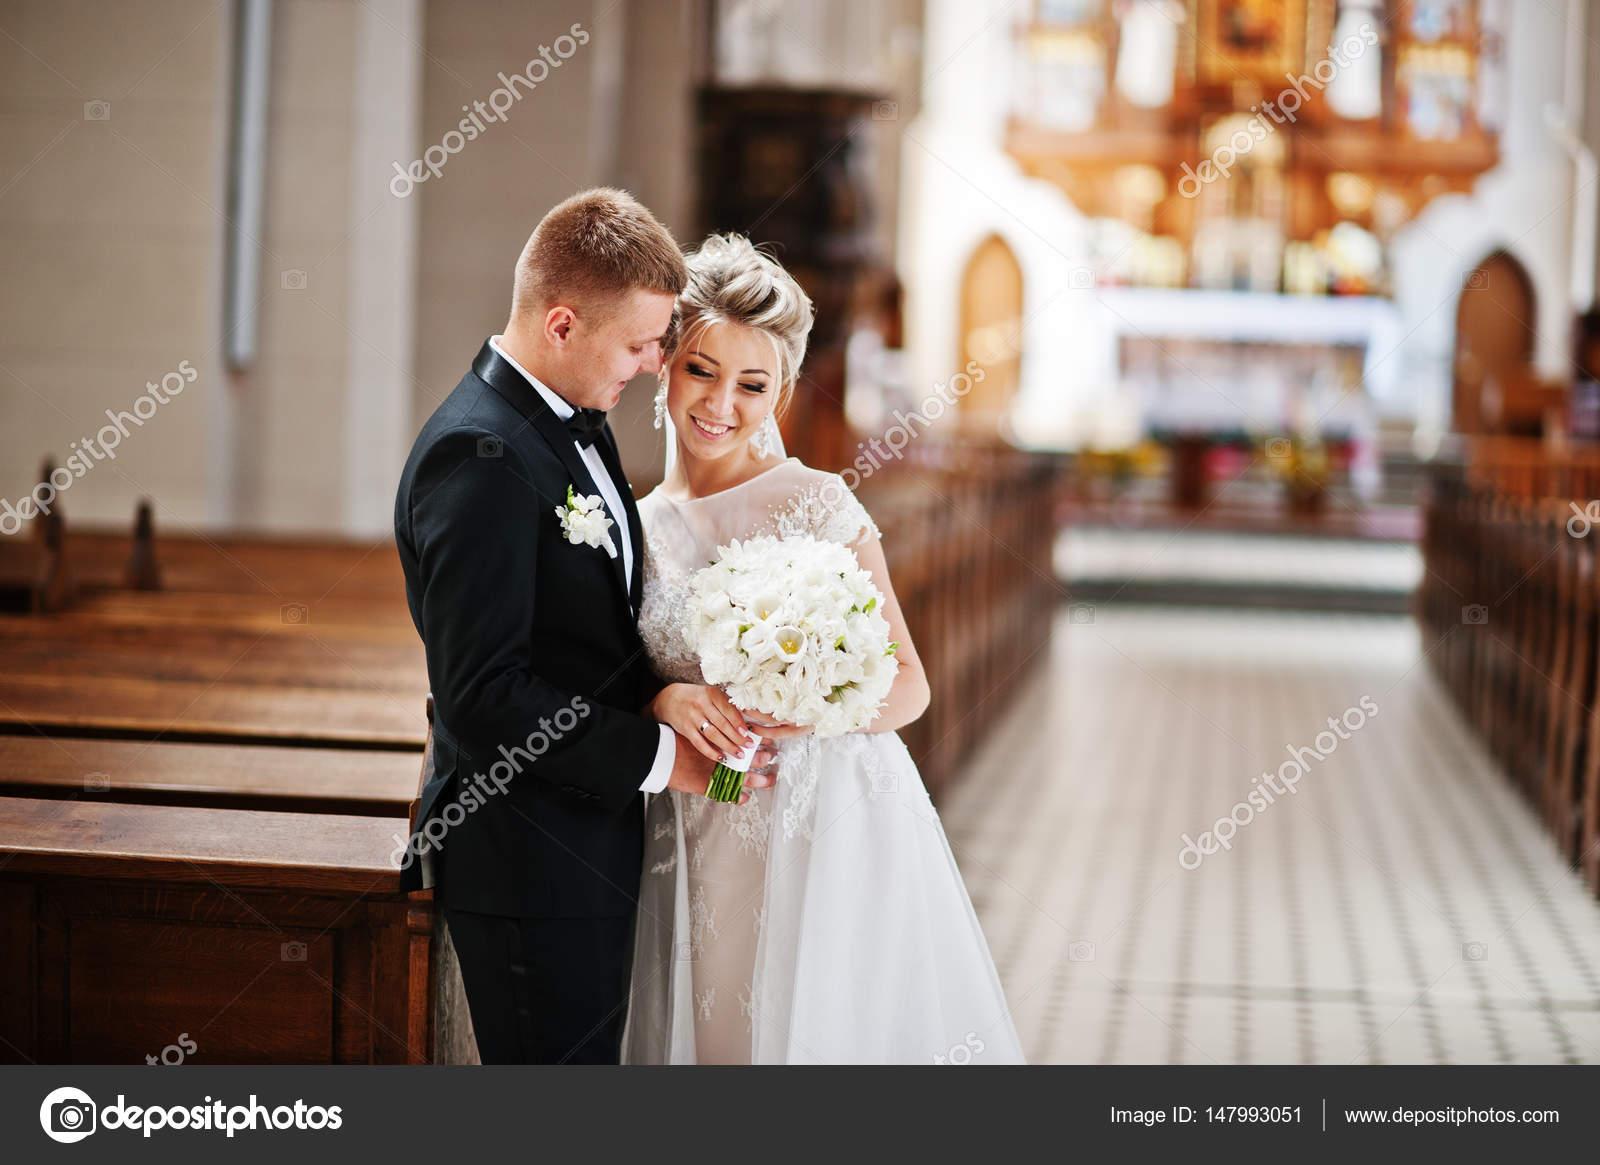 Matrimonio Catolico Precio : Imágenes matrimonio catolico sesión fotográfica de novios